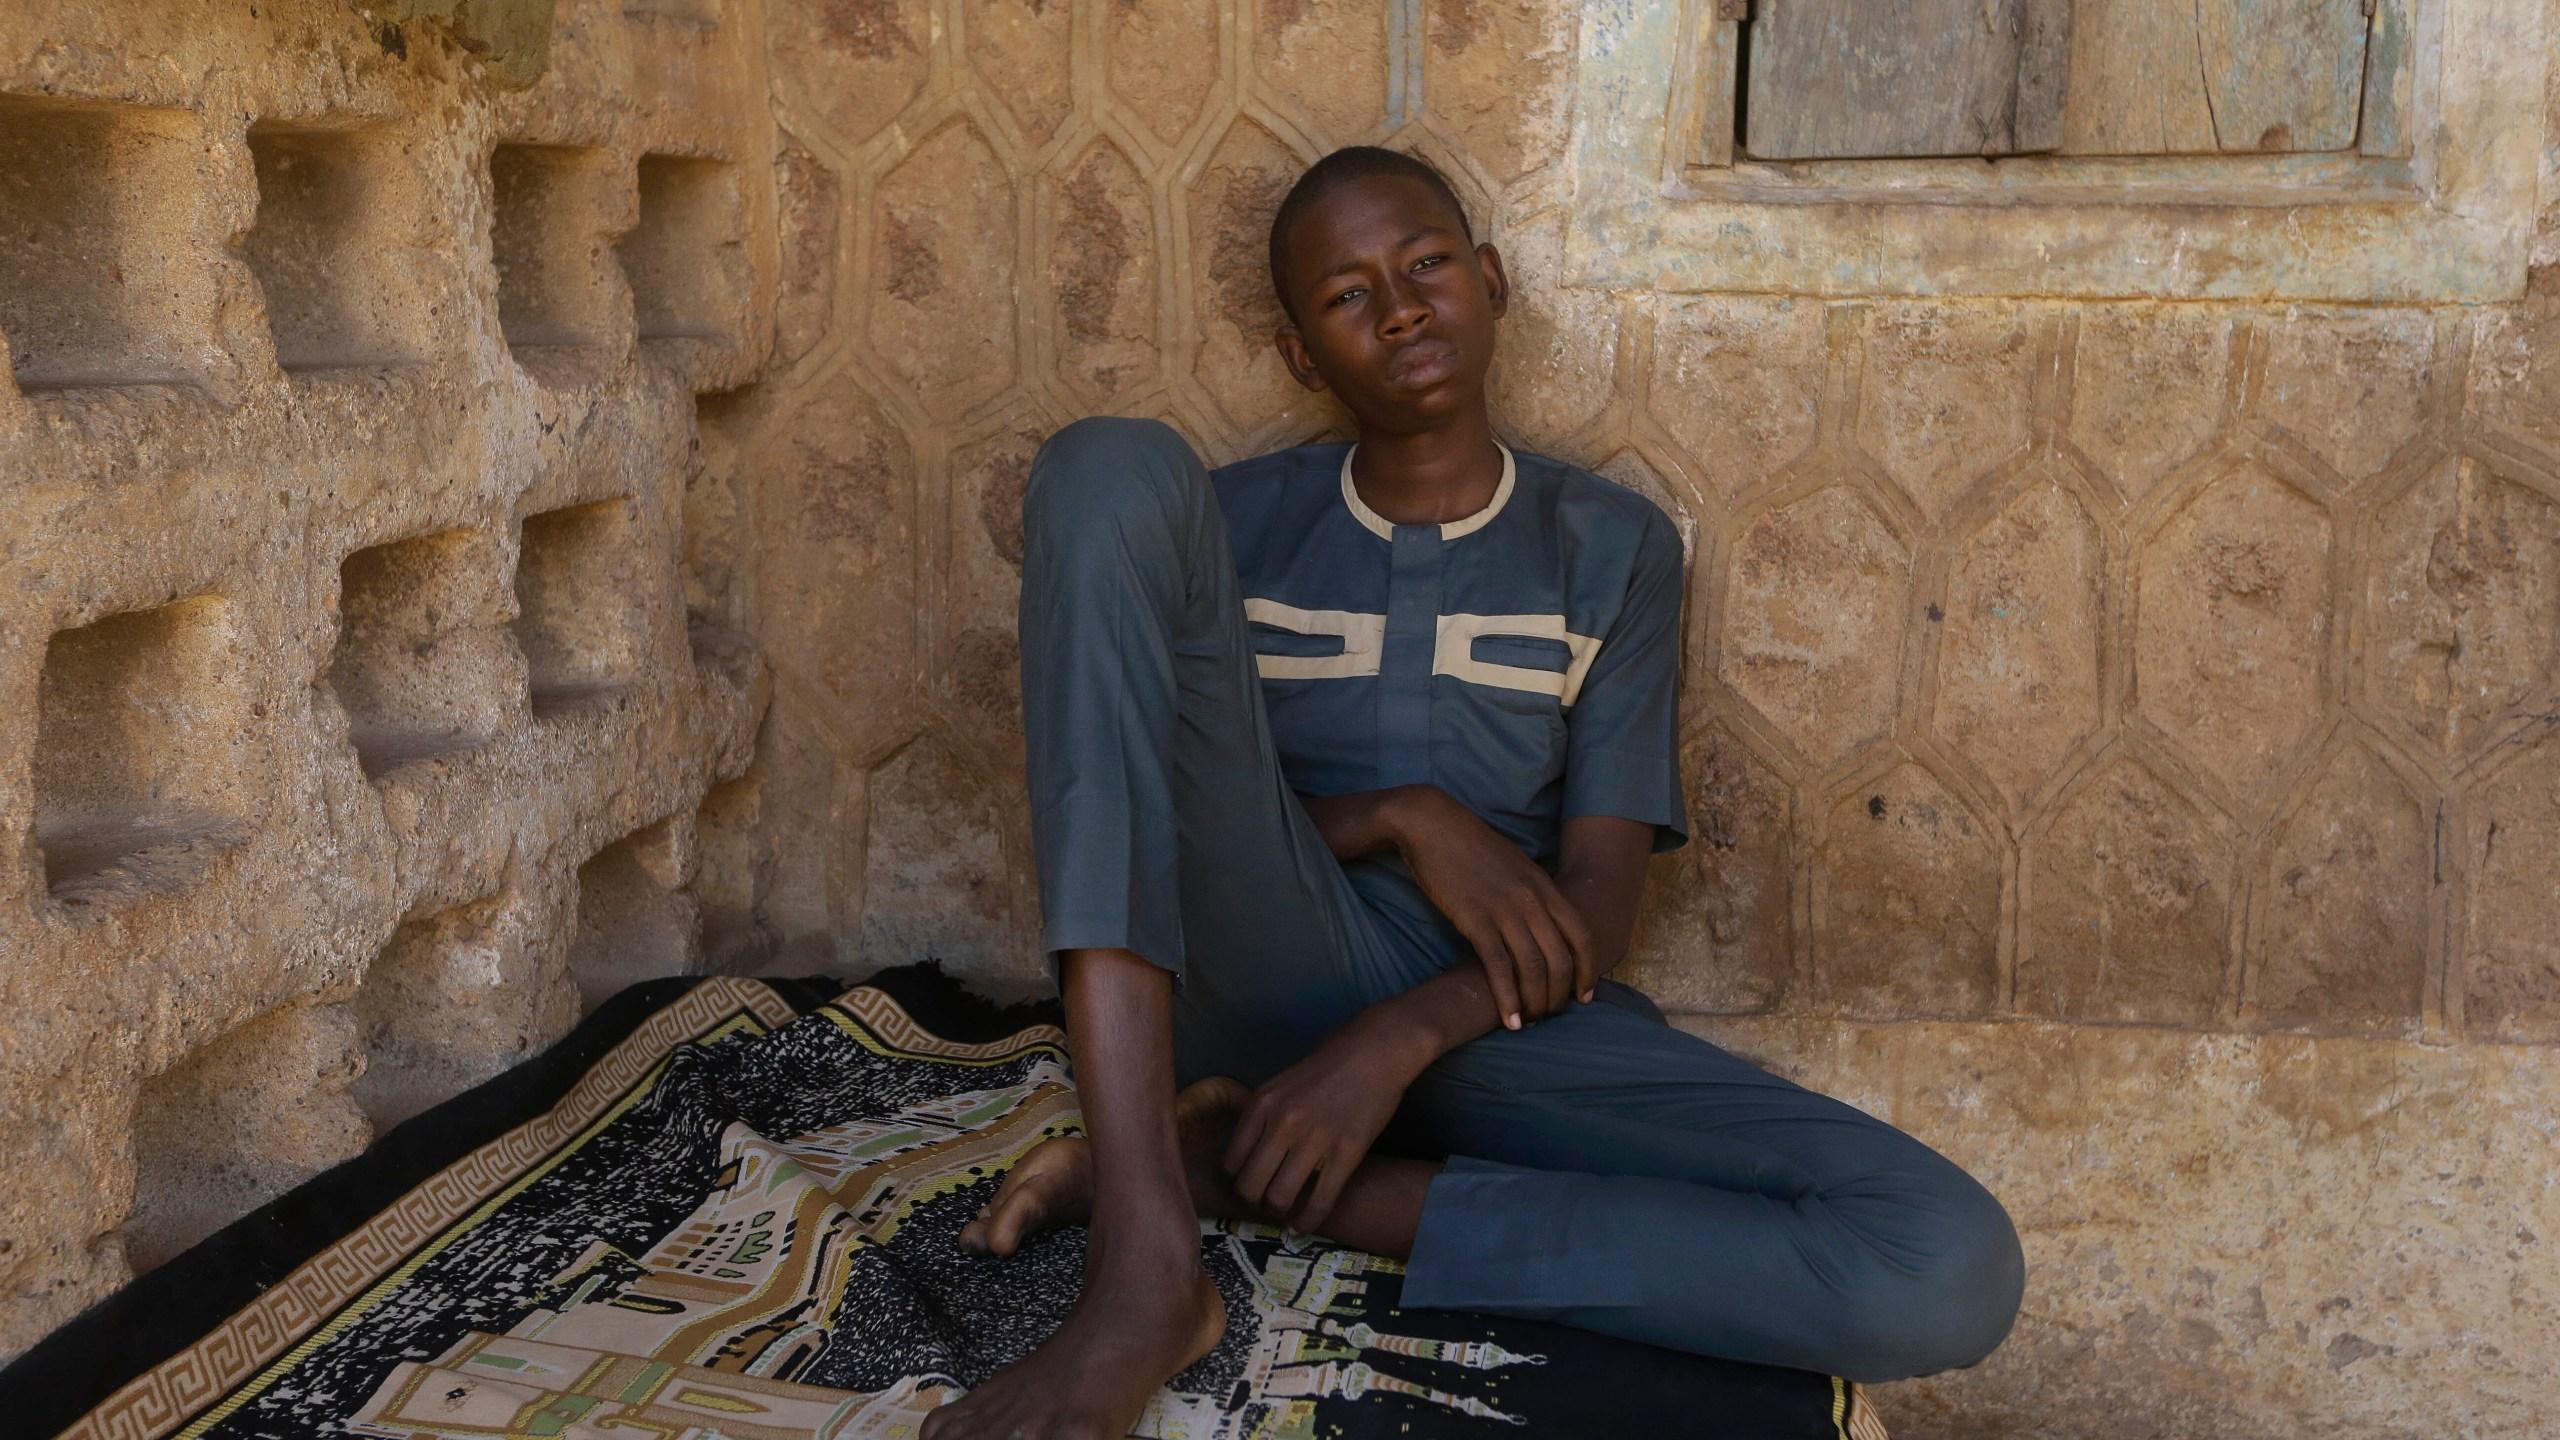 Usama Aminu